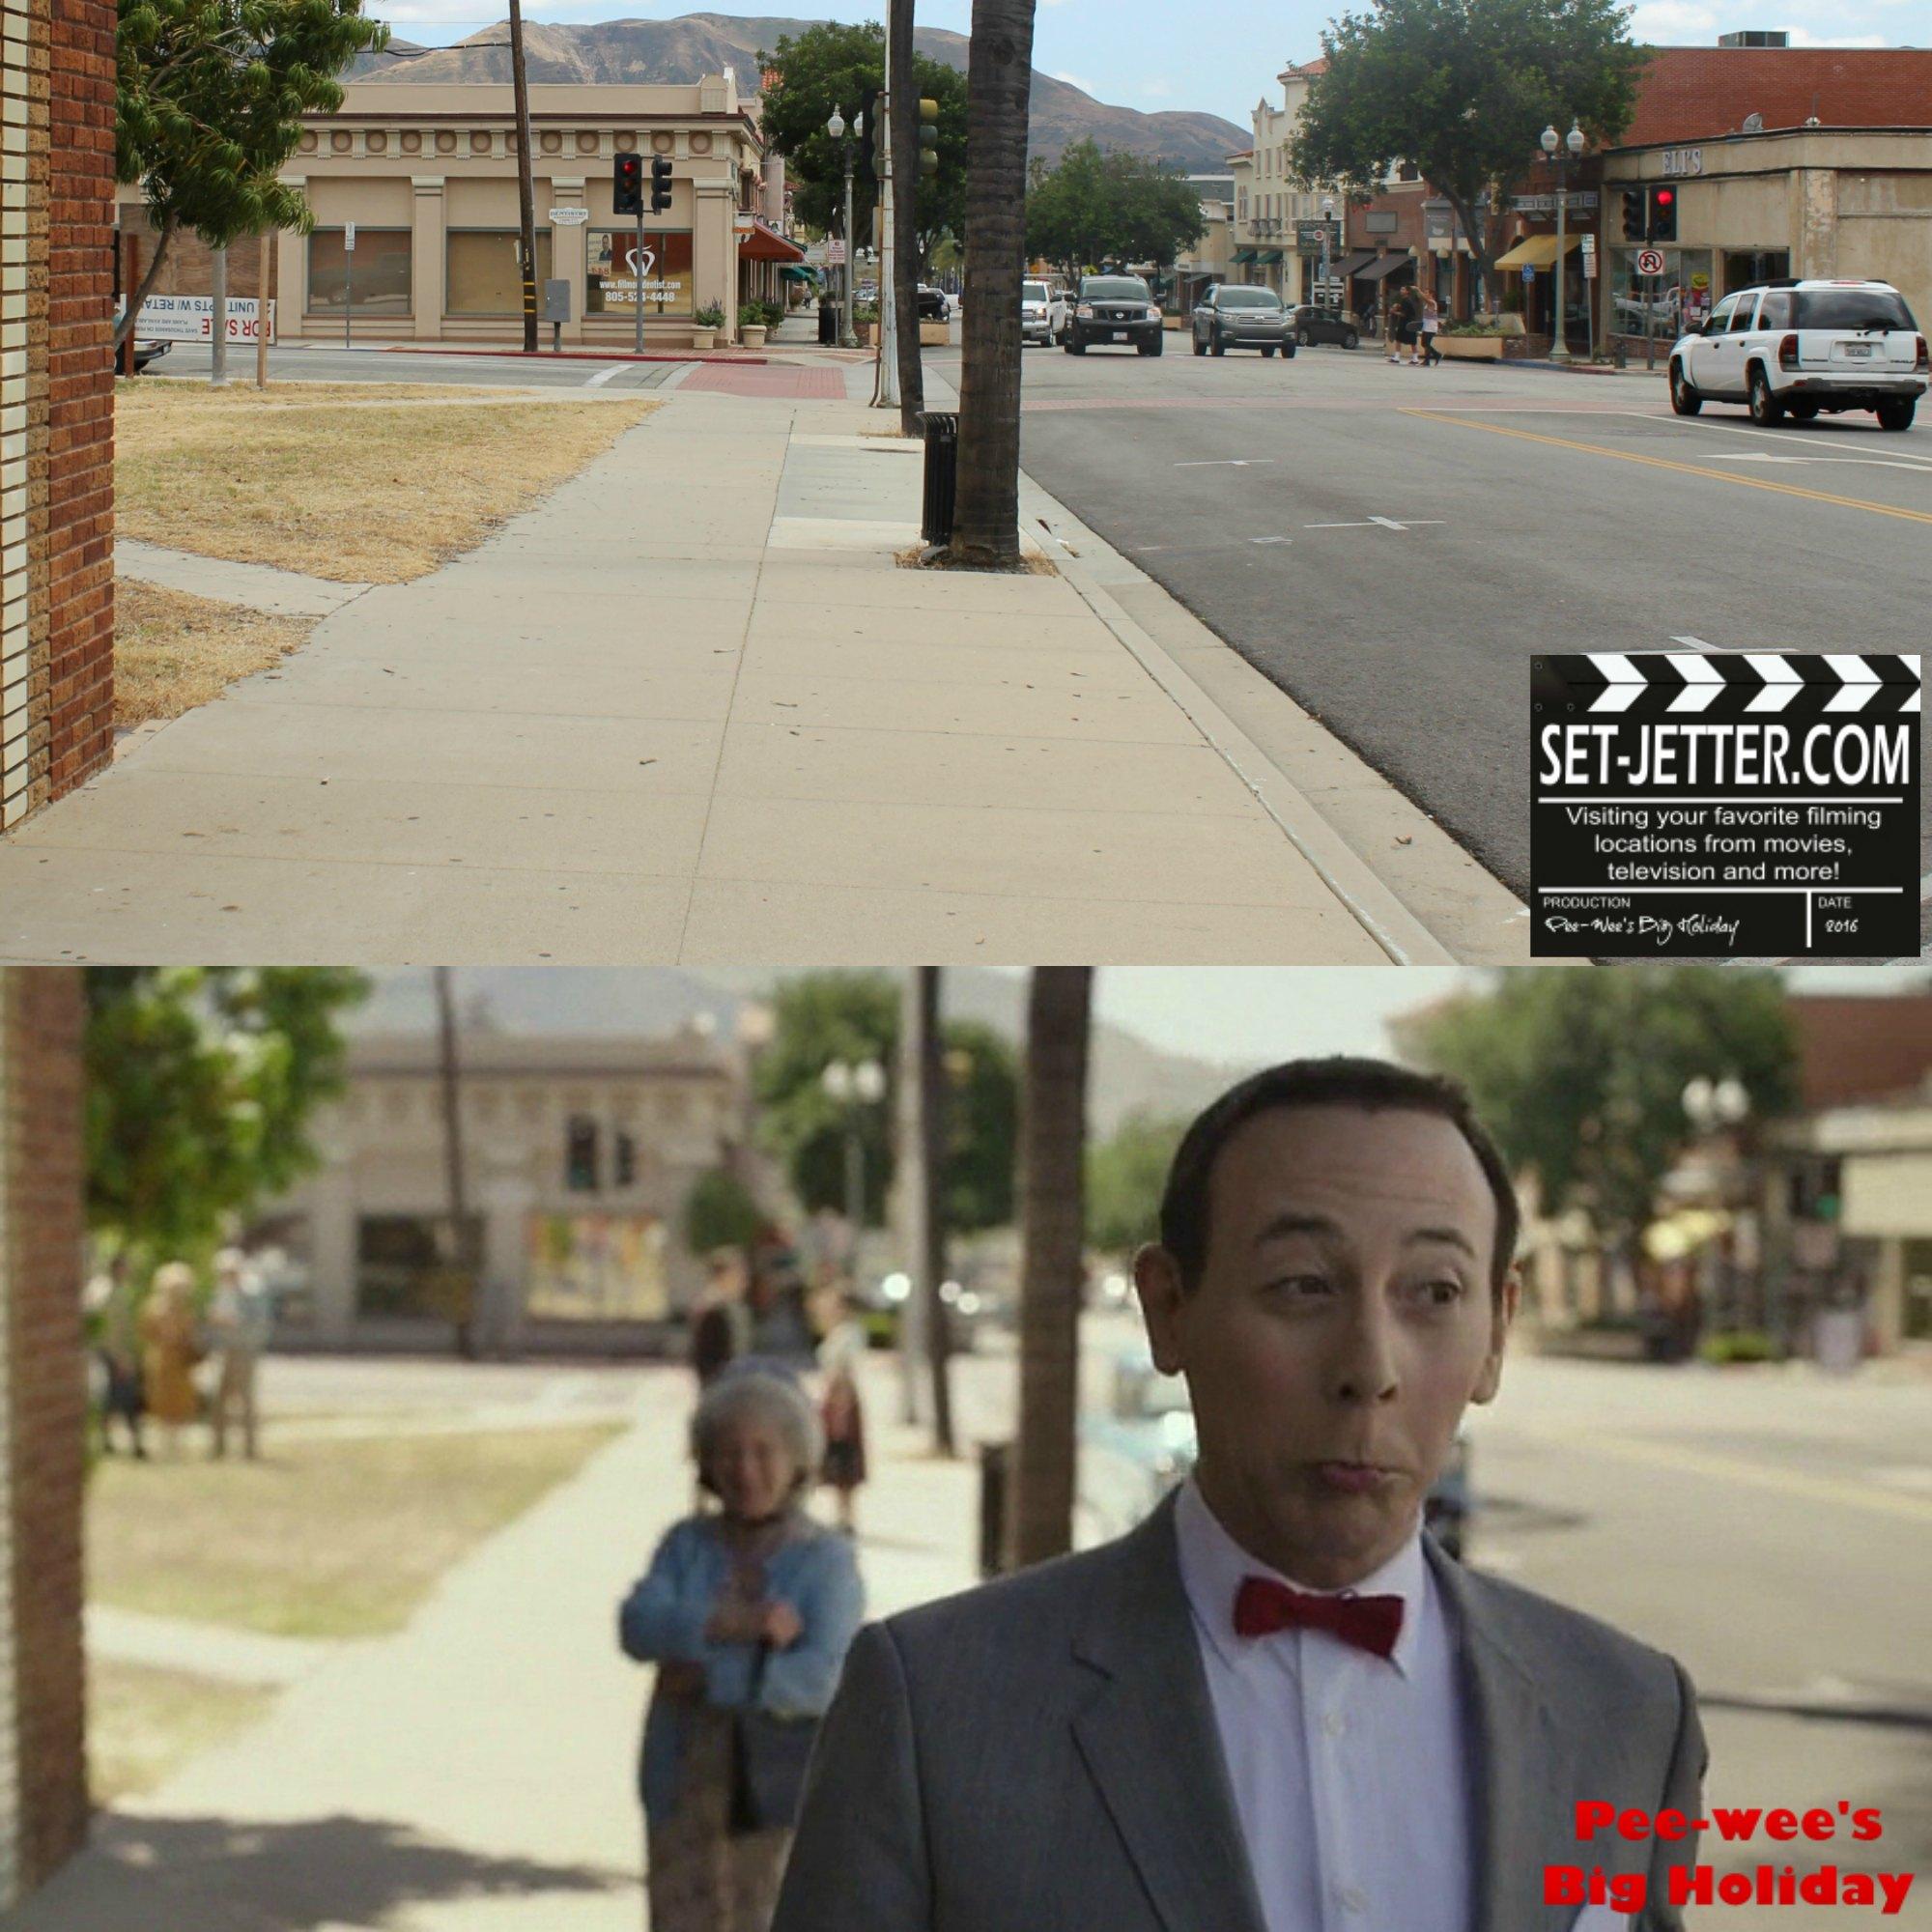 Pee Wee's Big Holiday comparison 251.jpg